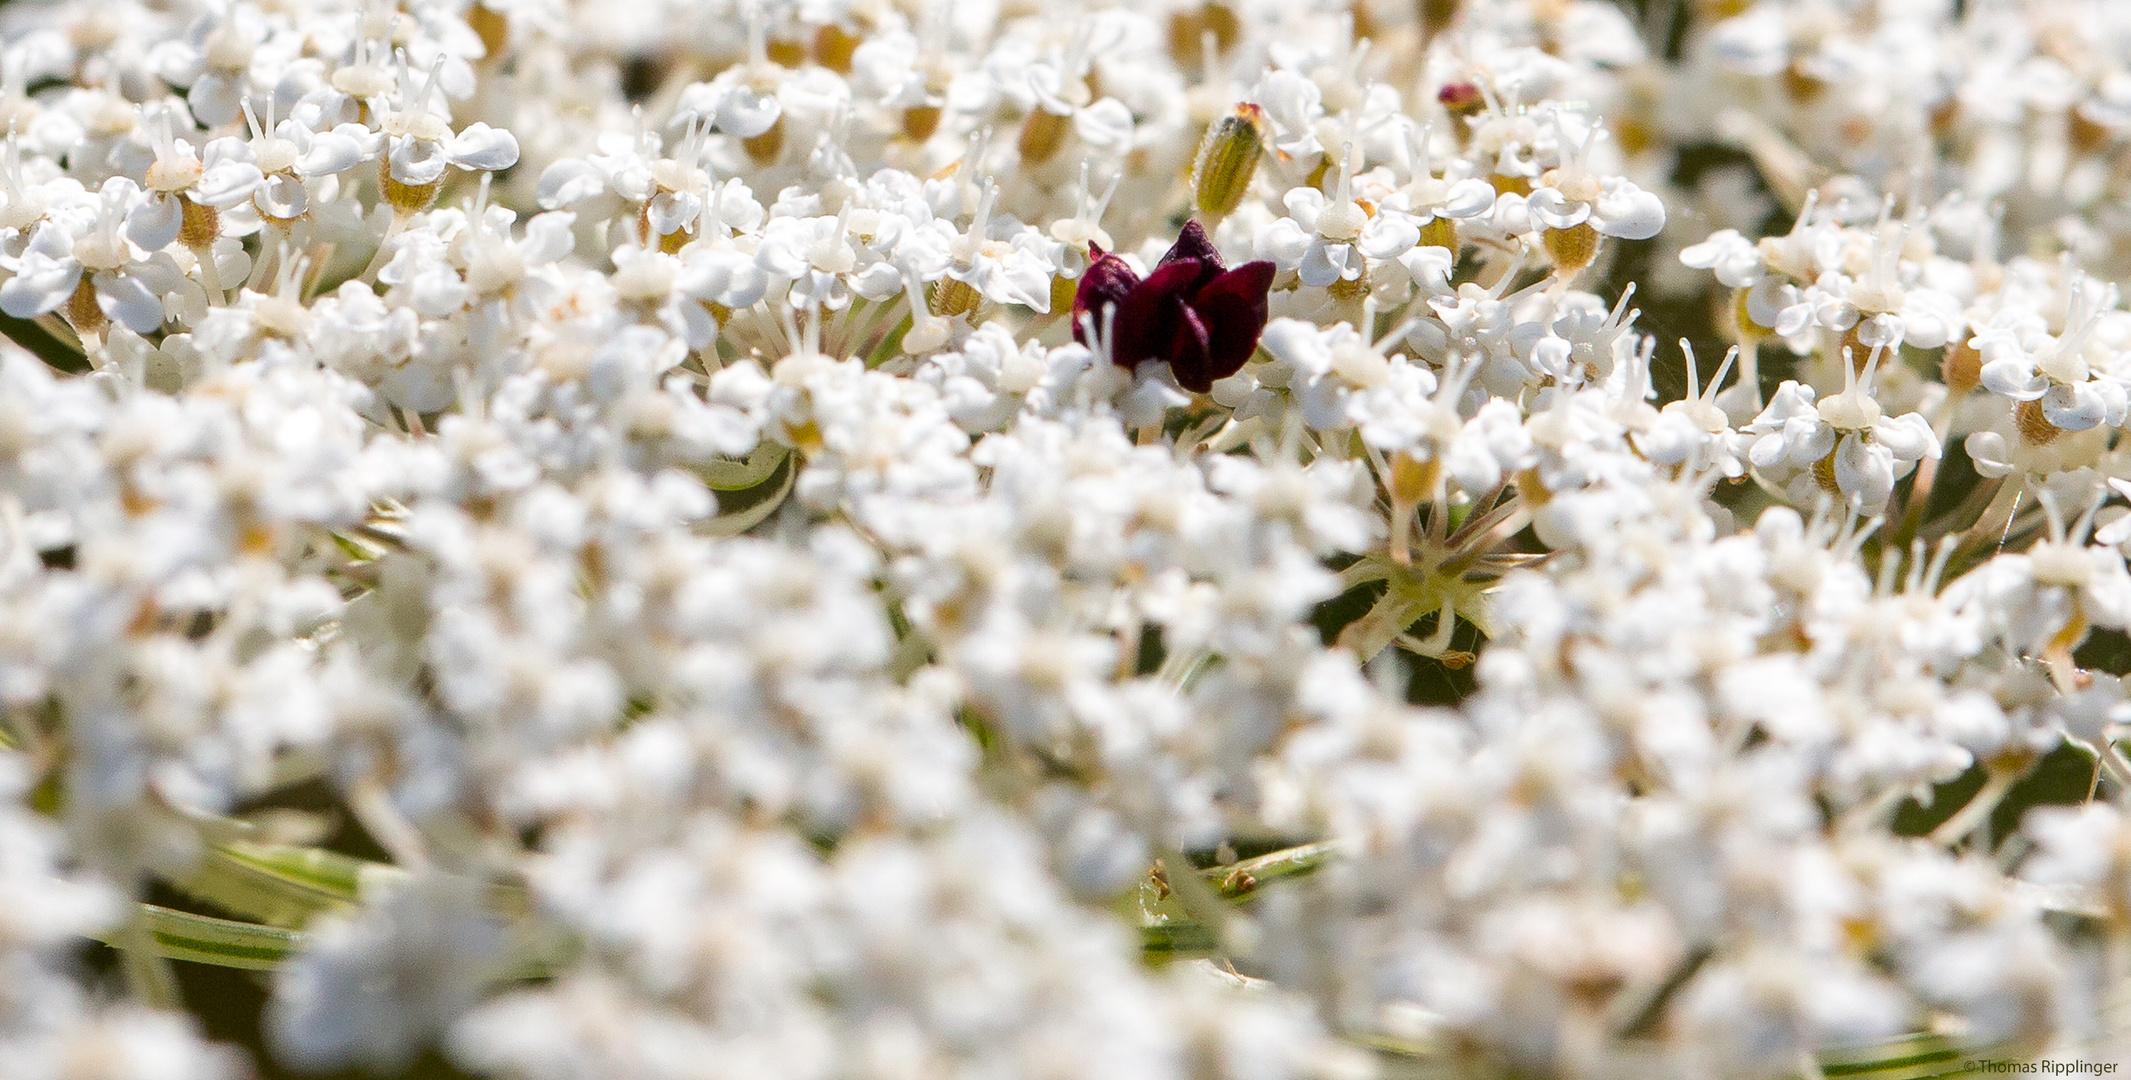 Wilde Möhre (Daucus carota subsp. carota).